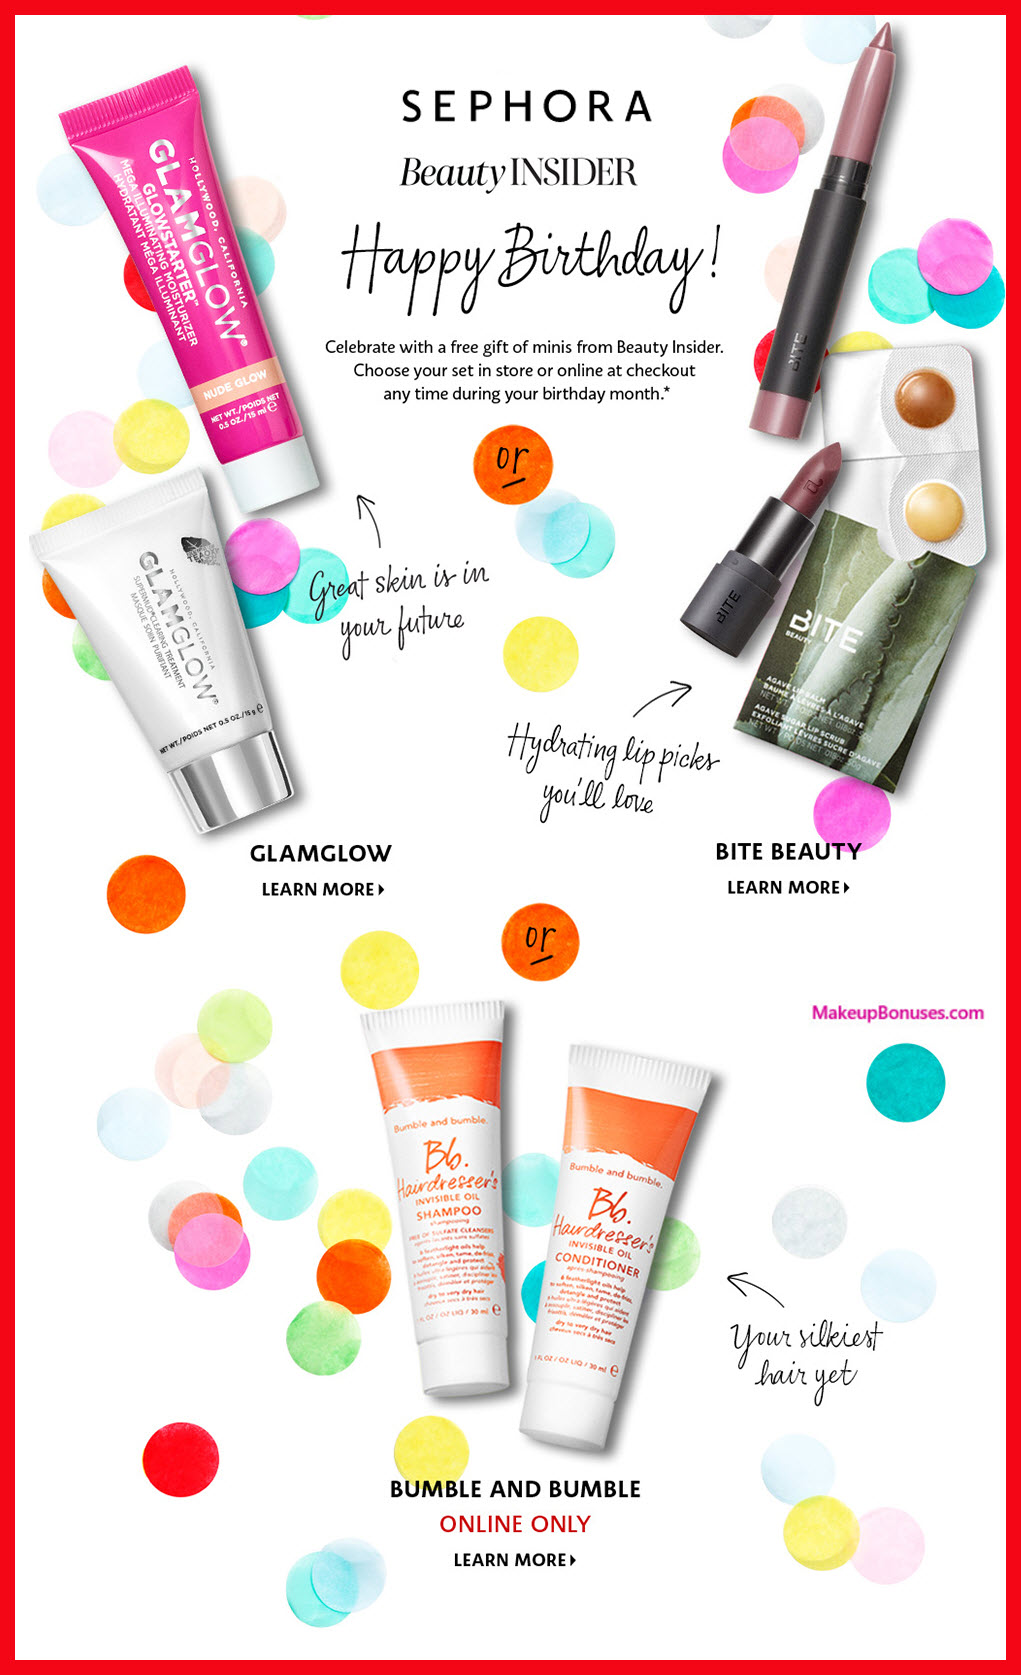 Sephora Birthday Gift - MakeupBonuses.com #sephora